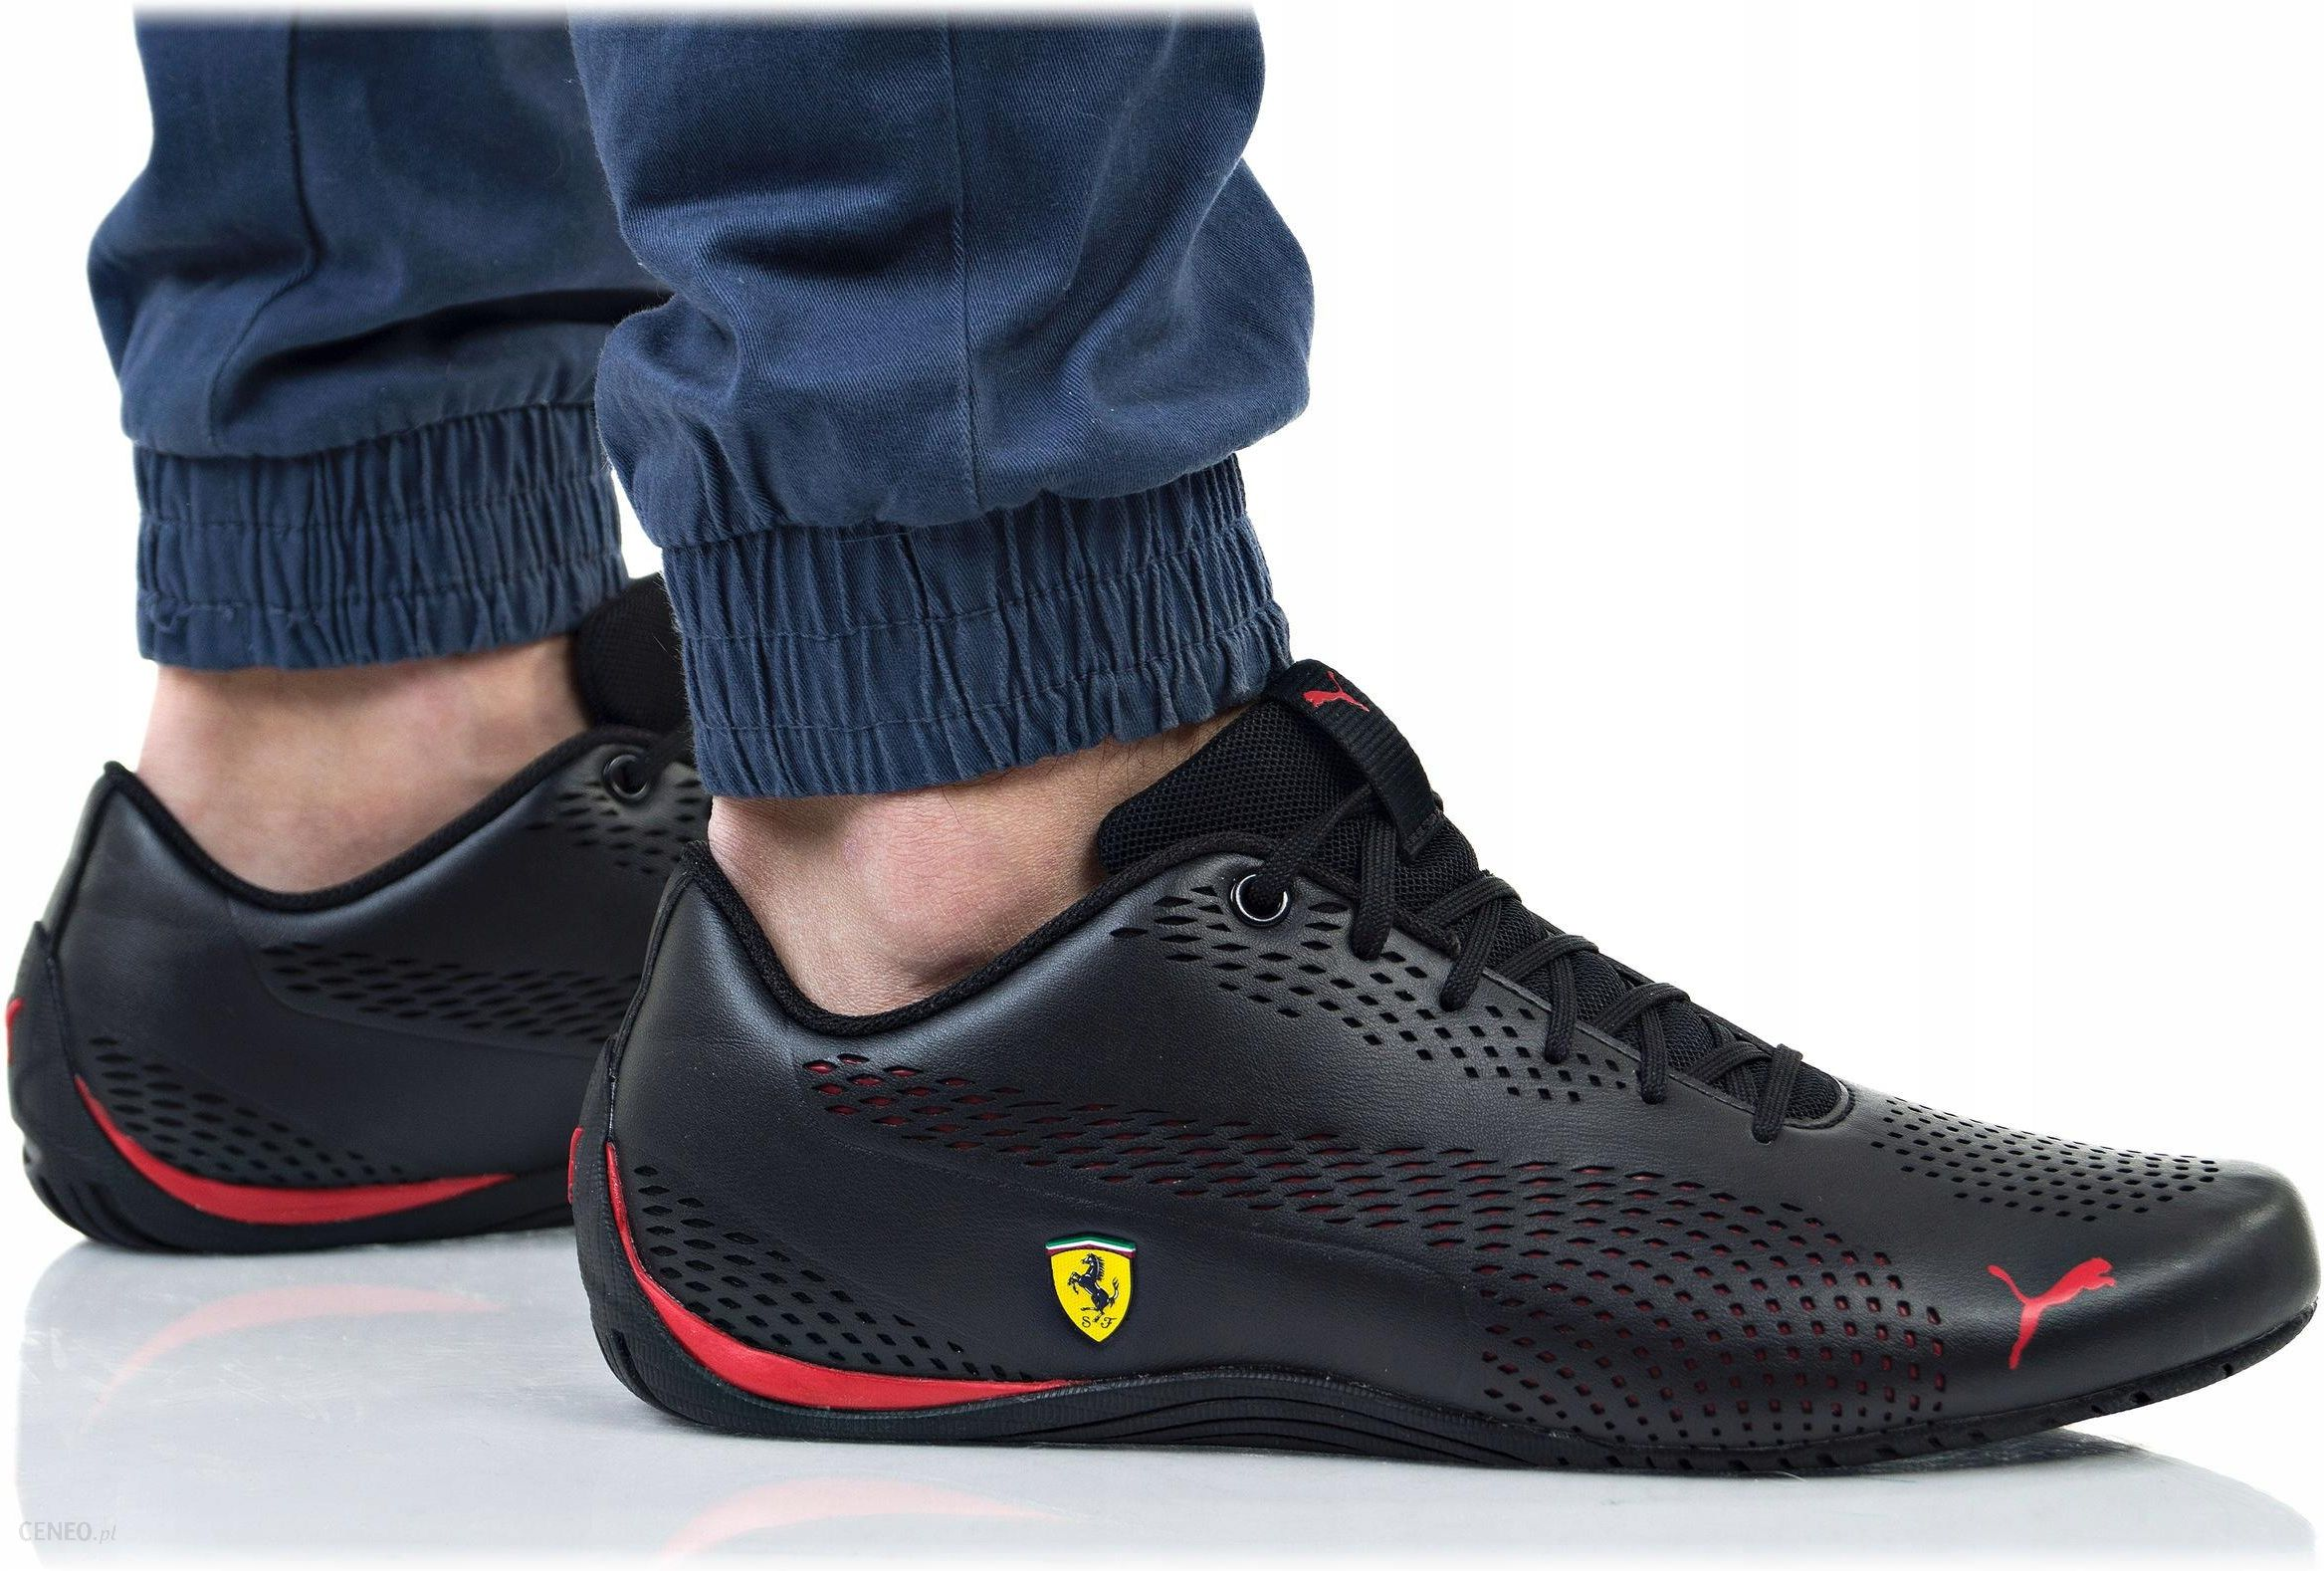 51445f308 Buty Puma Męskie Ferrari Sf Drift Cat 5 306422 01 - Ceny i opinie ...